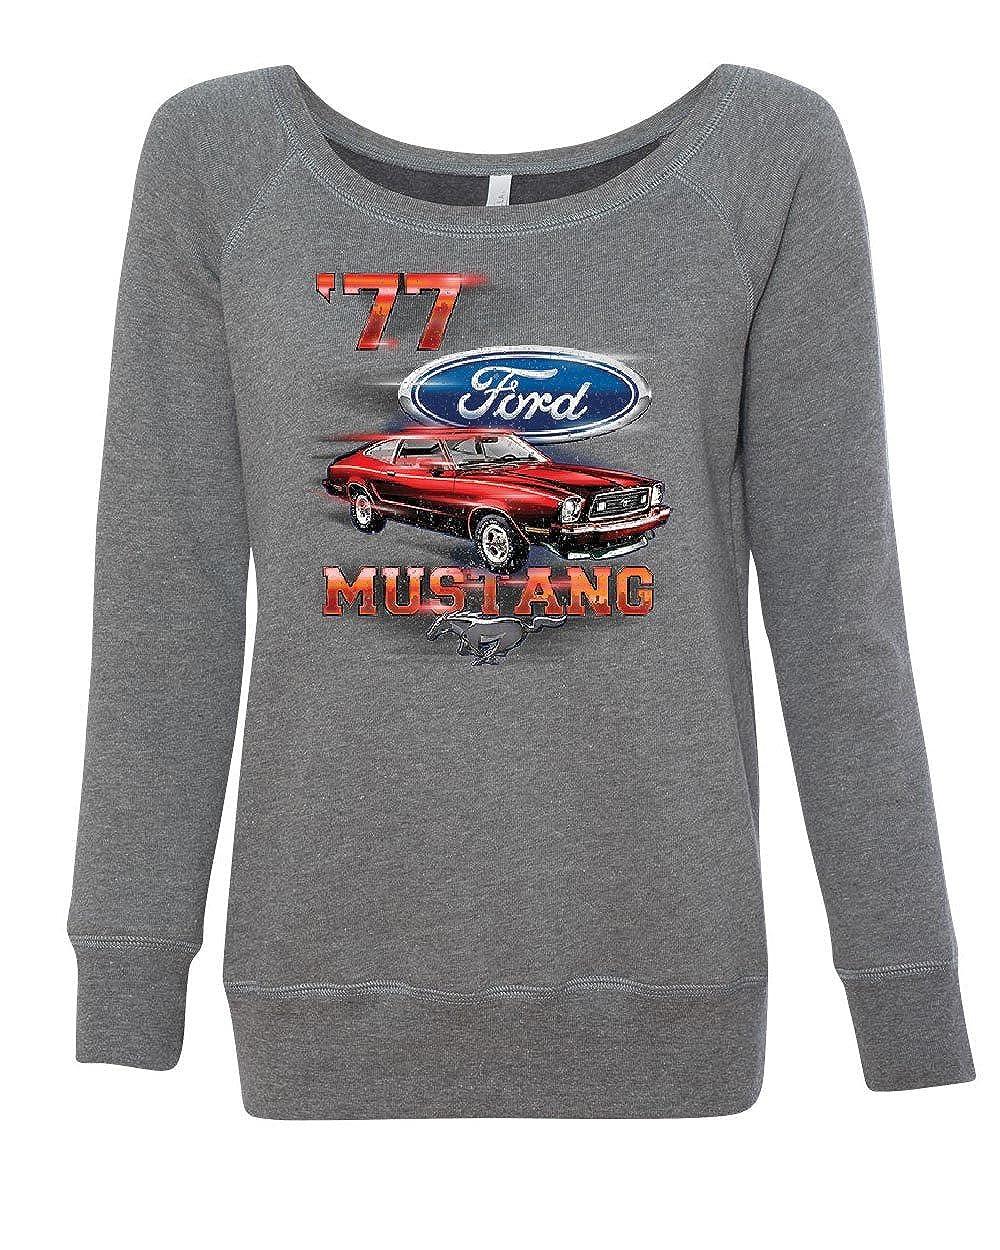 Ford Mustang 77 Womens Sweatshirt American Classic Muscle Car